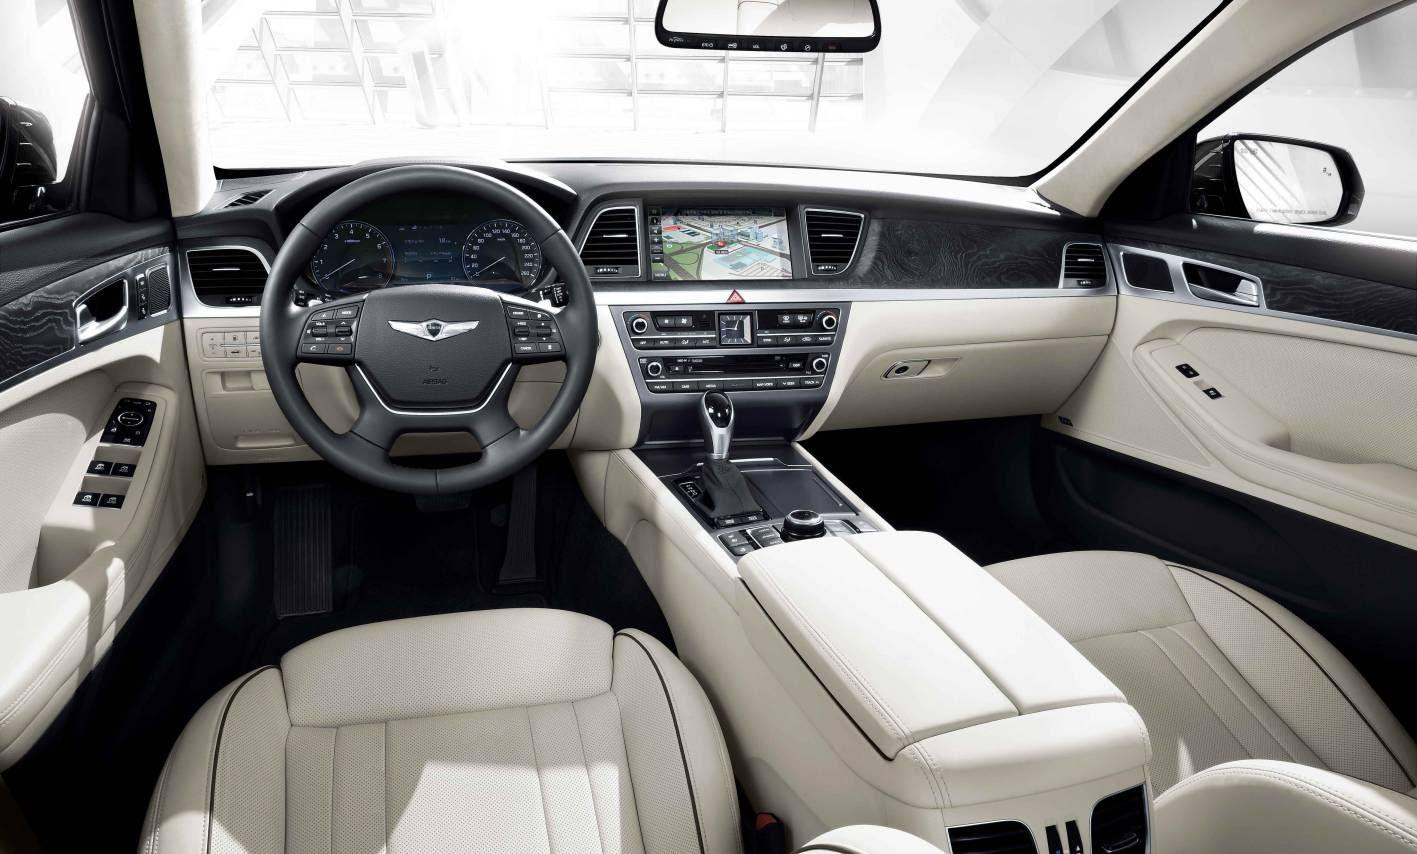 2014 Hyundai Genesis sedan interior dashboard  ForceGT.com